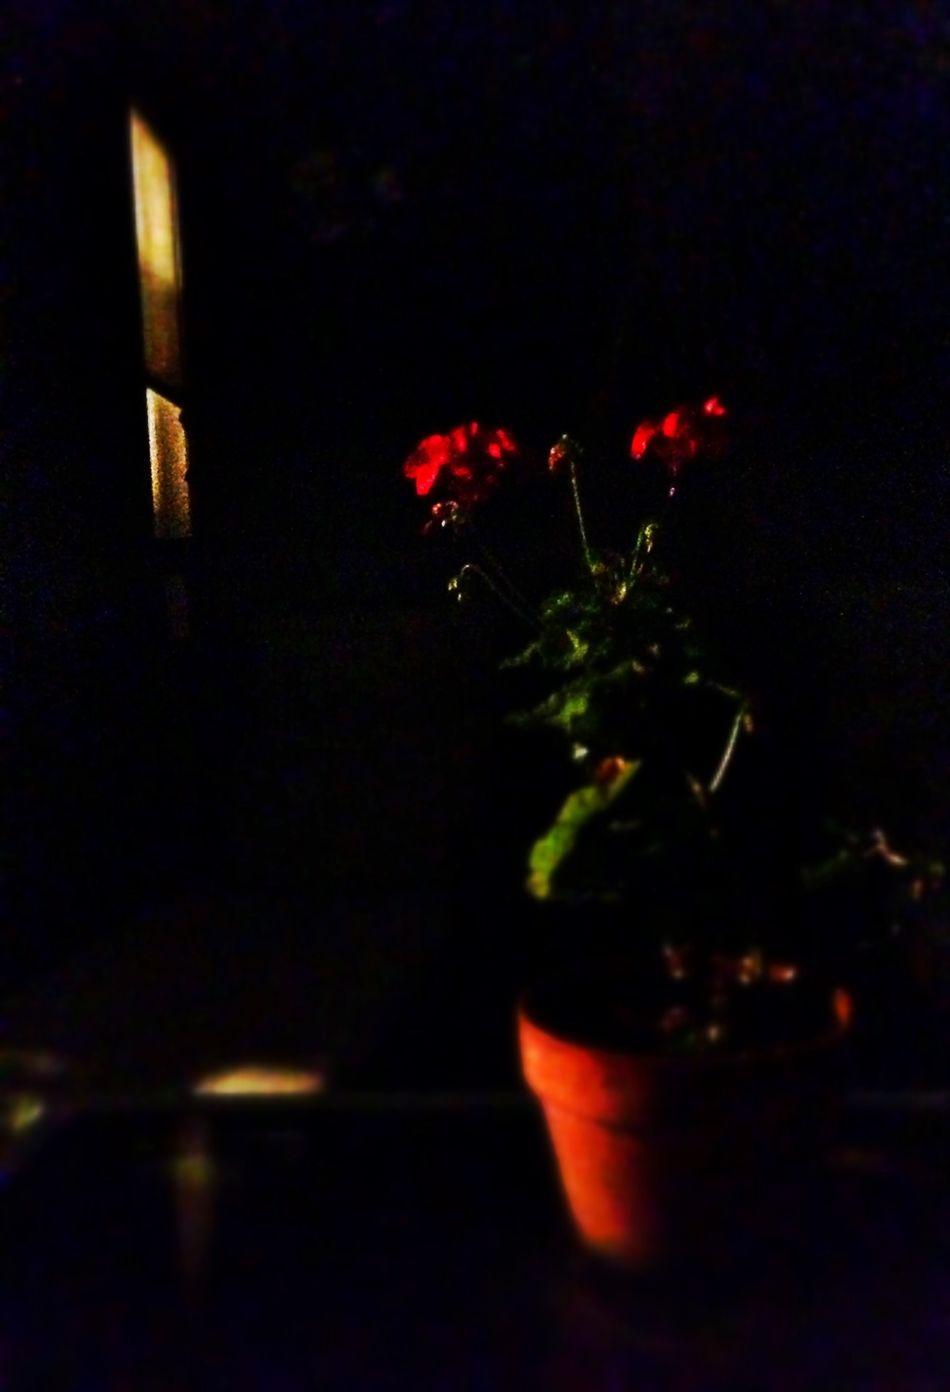 night flowers. Night Observing Death Dark